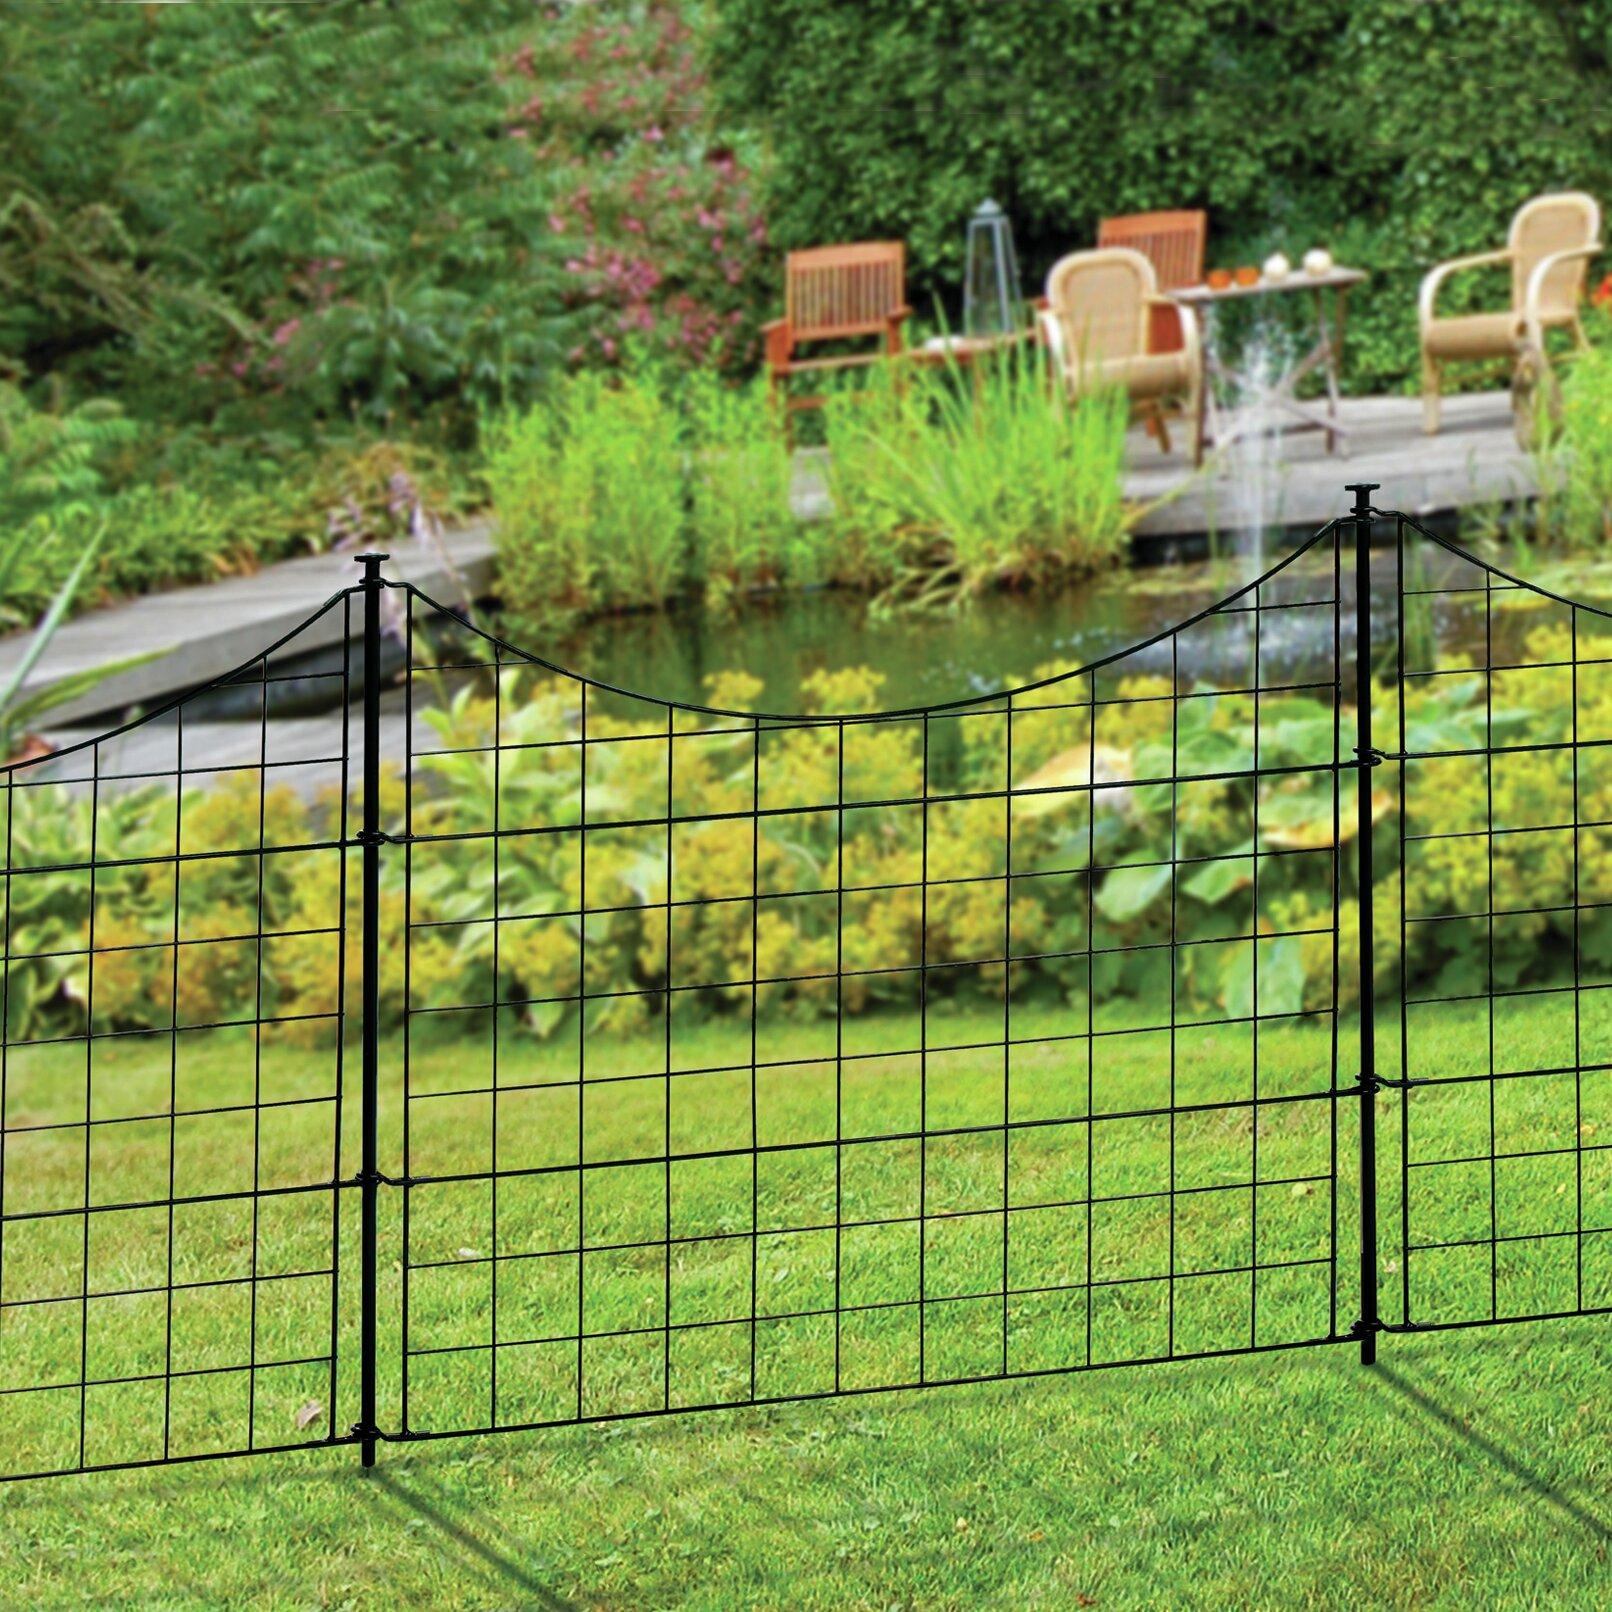 Wam Bam 25 In. X 137.5 In. Zippity Garden Fence U0026 Reviews | Wayfair